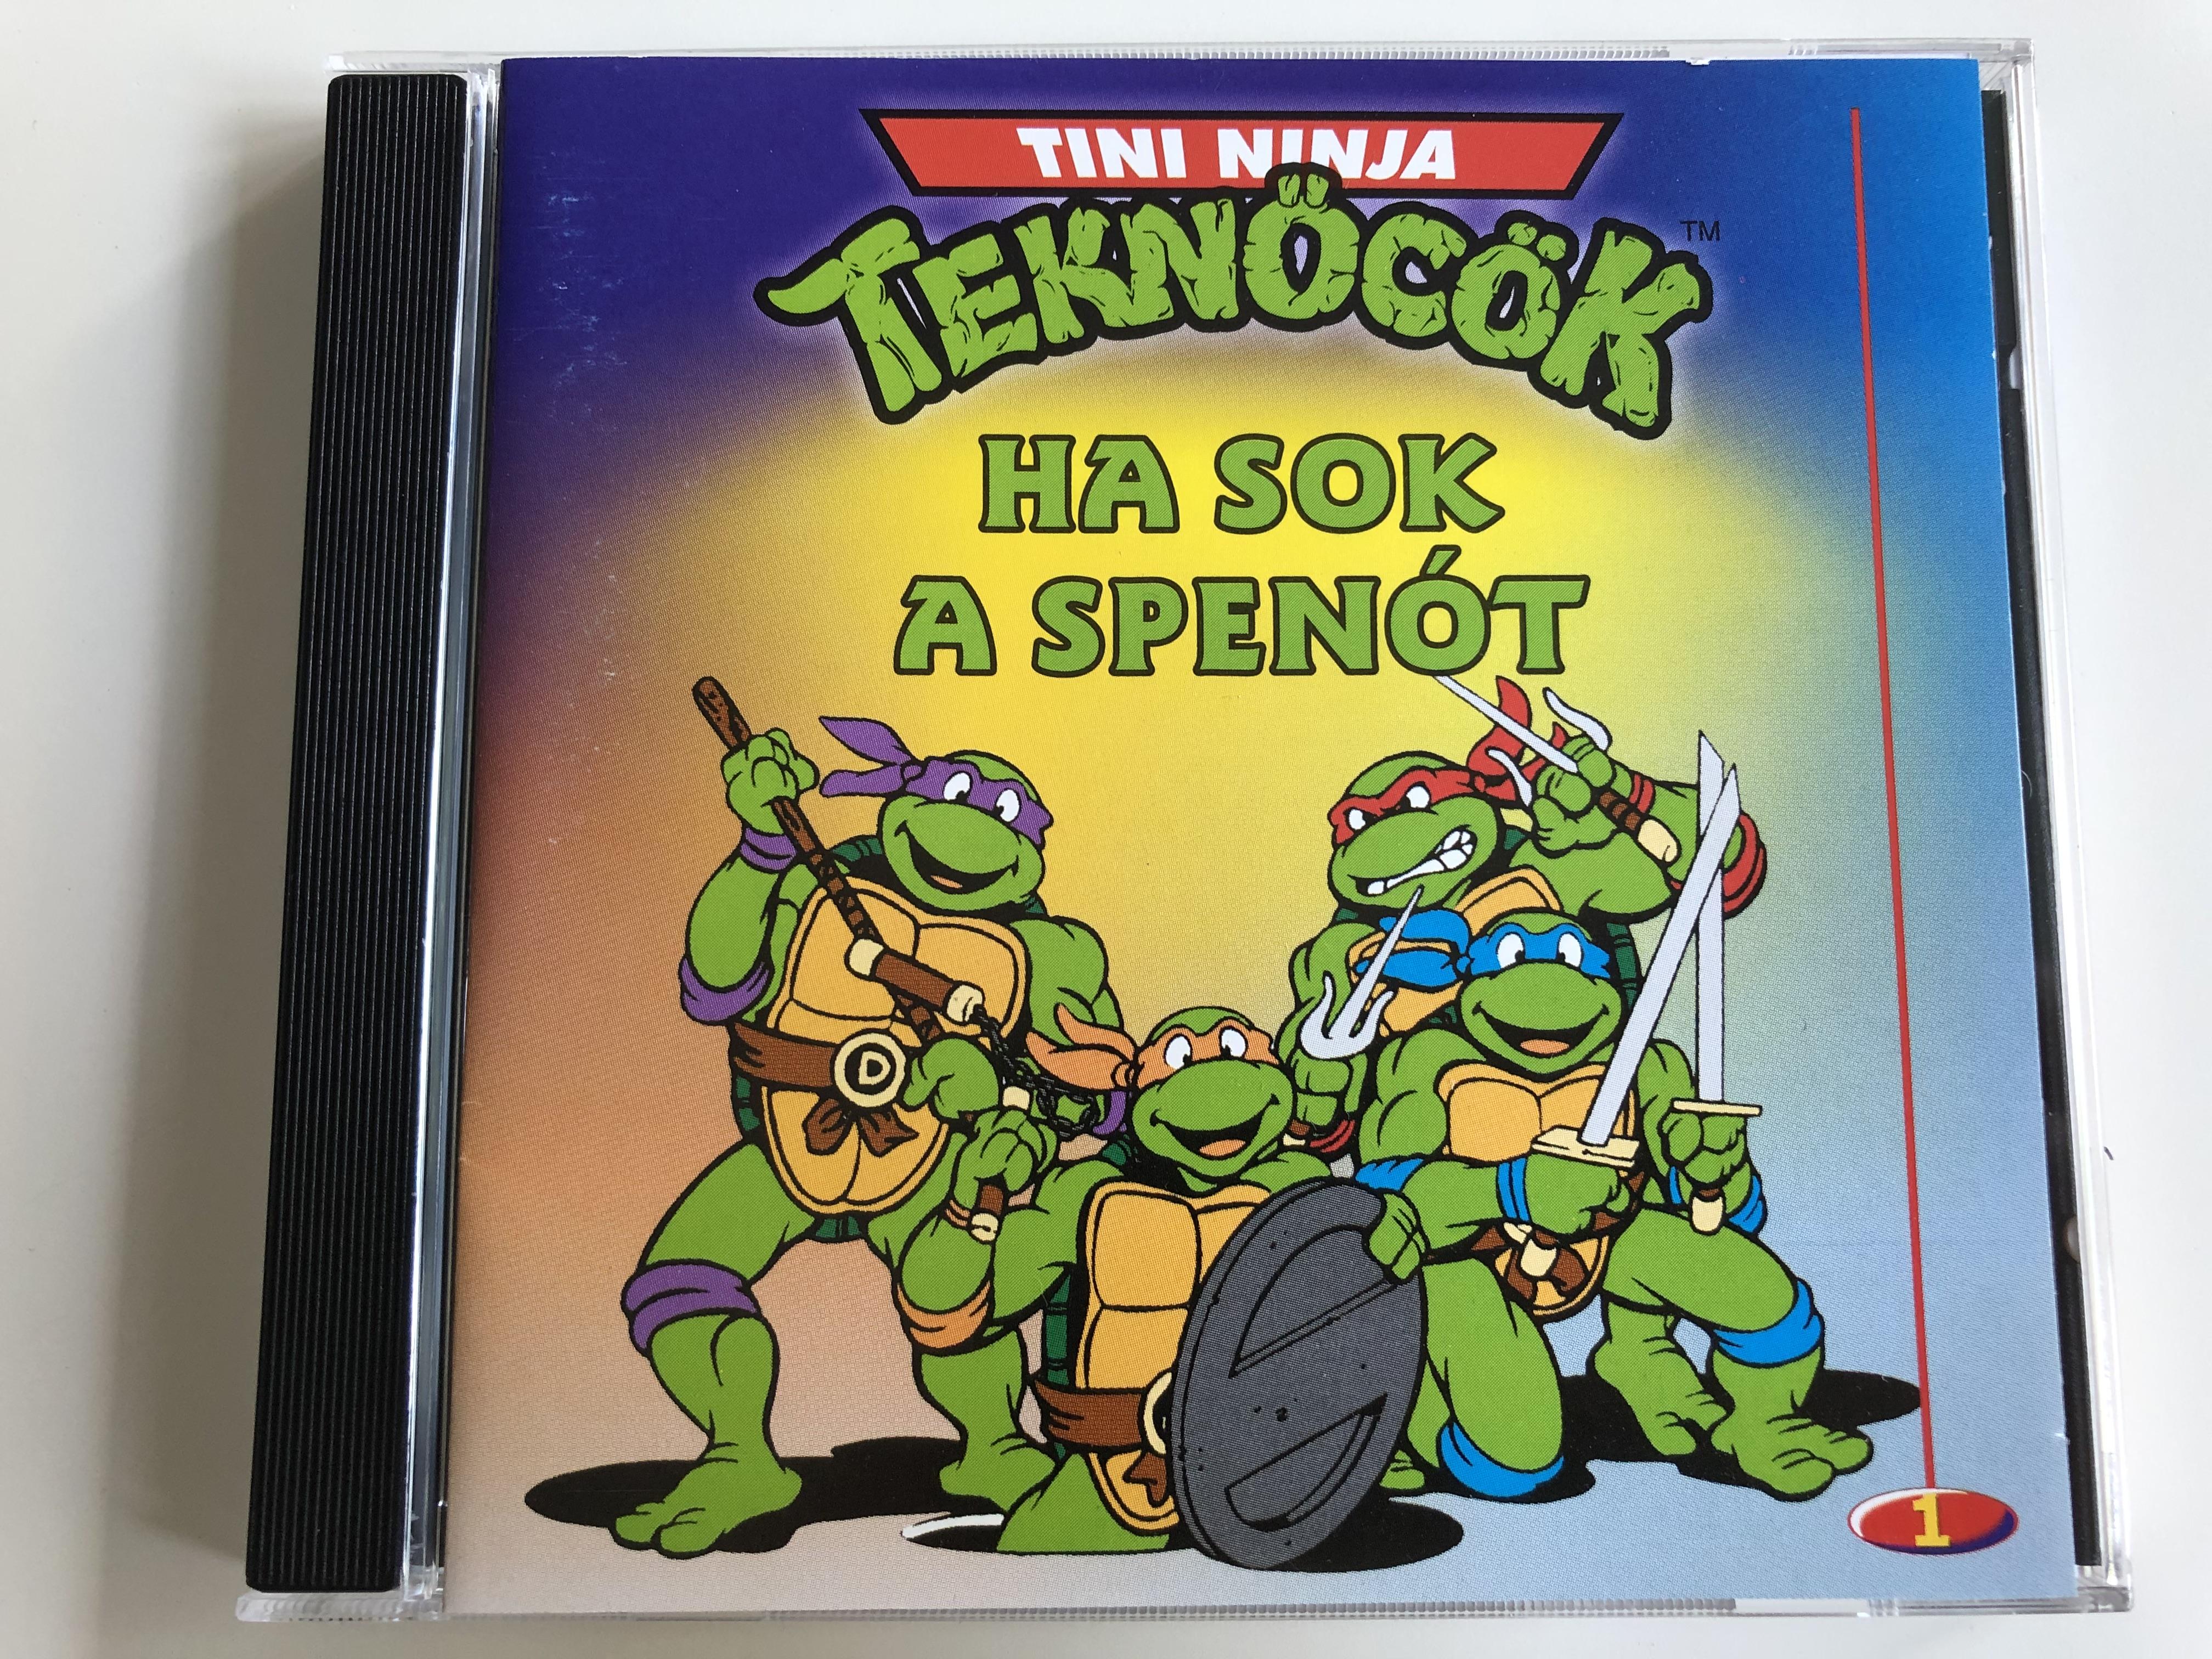 tini-ninja-tekn-c-k-ha-sok-a-spen-t-audio-cd-2000-teenage-mutant-ninja-turtles-music-cd-in-hungarian-1-.jpg